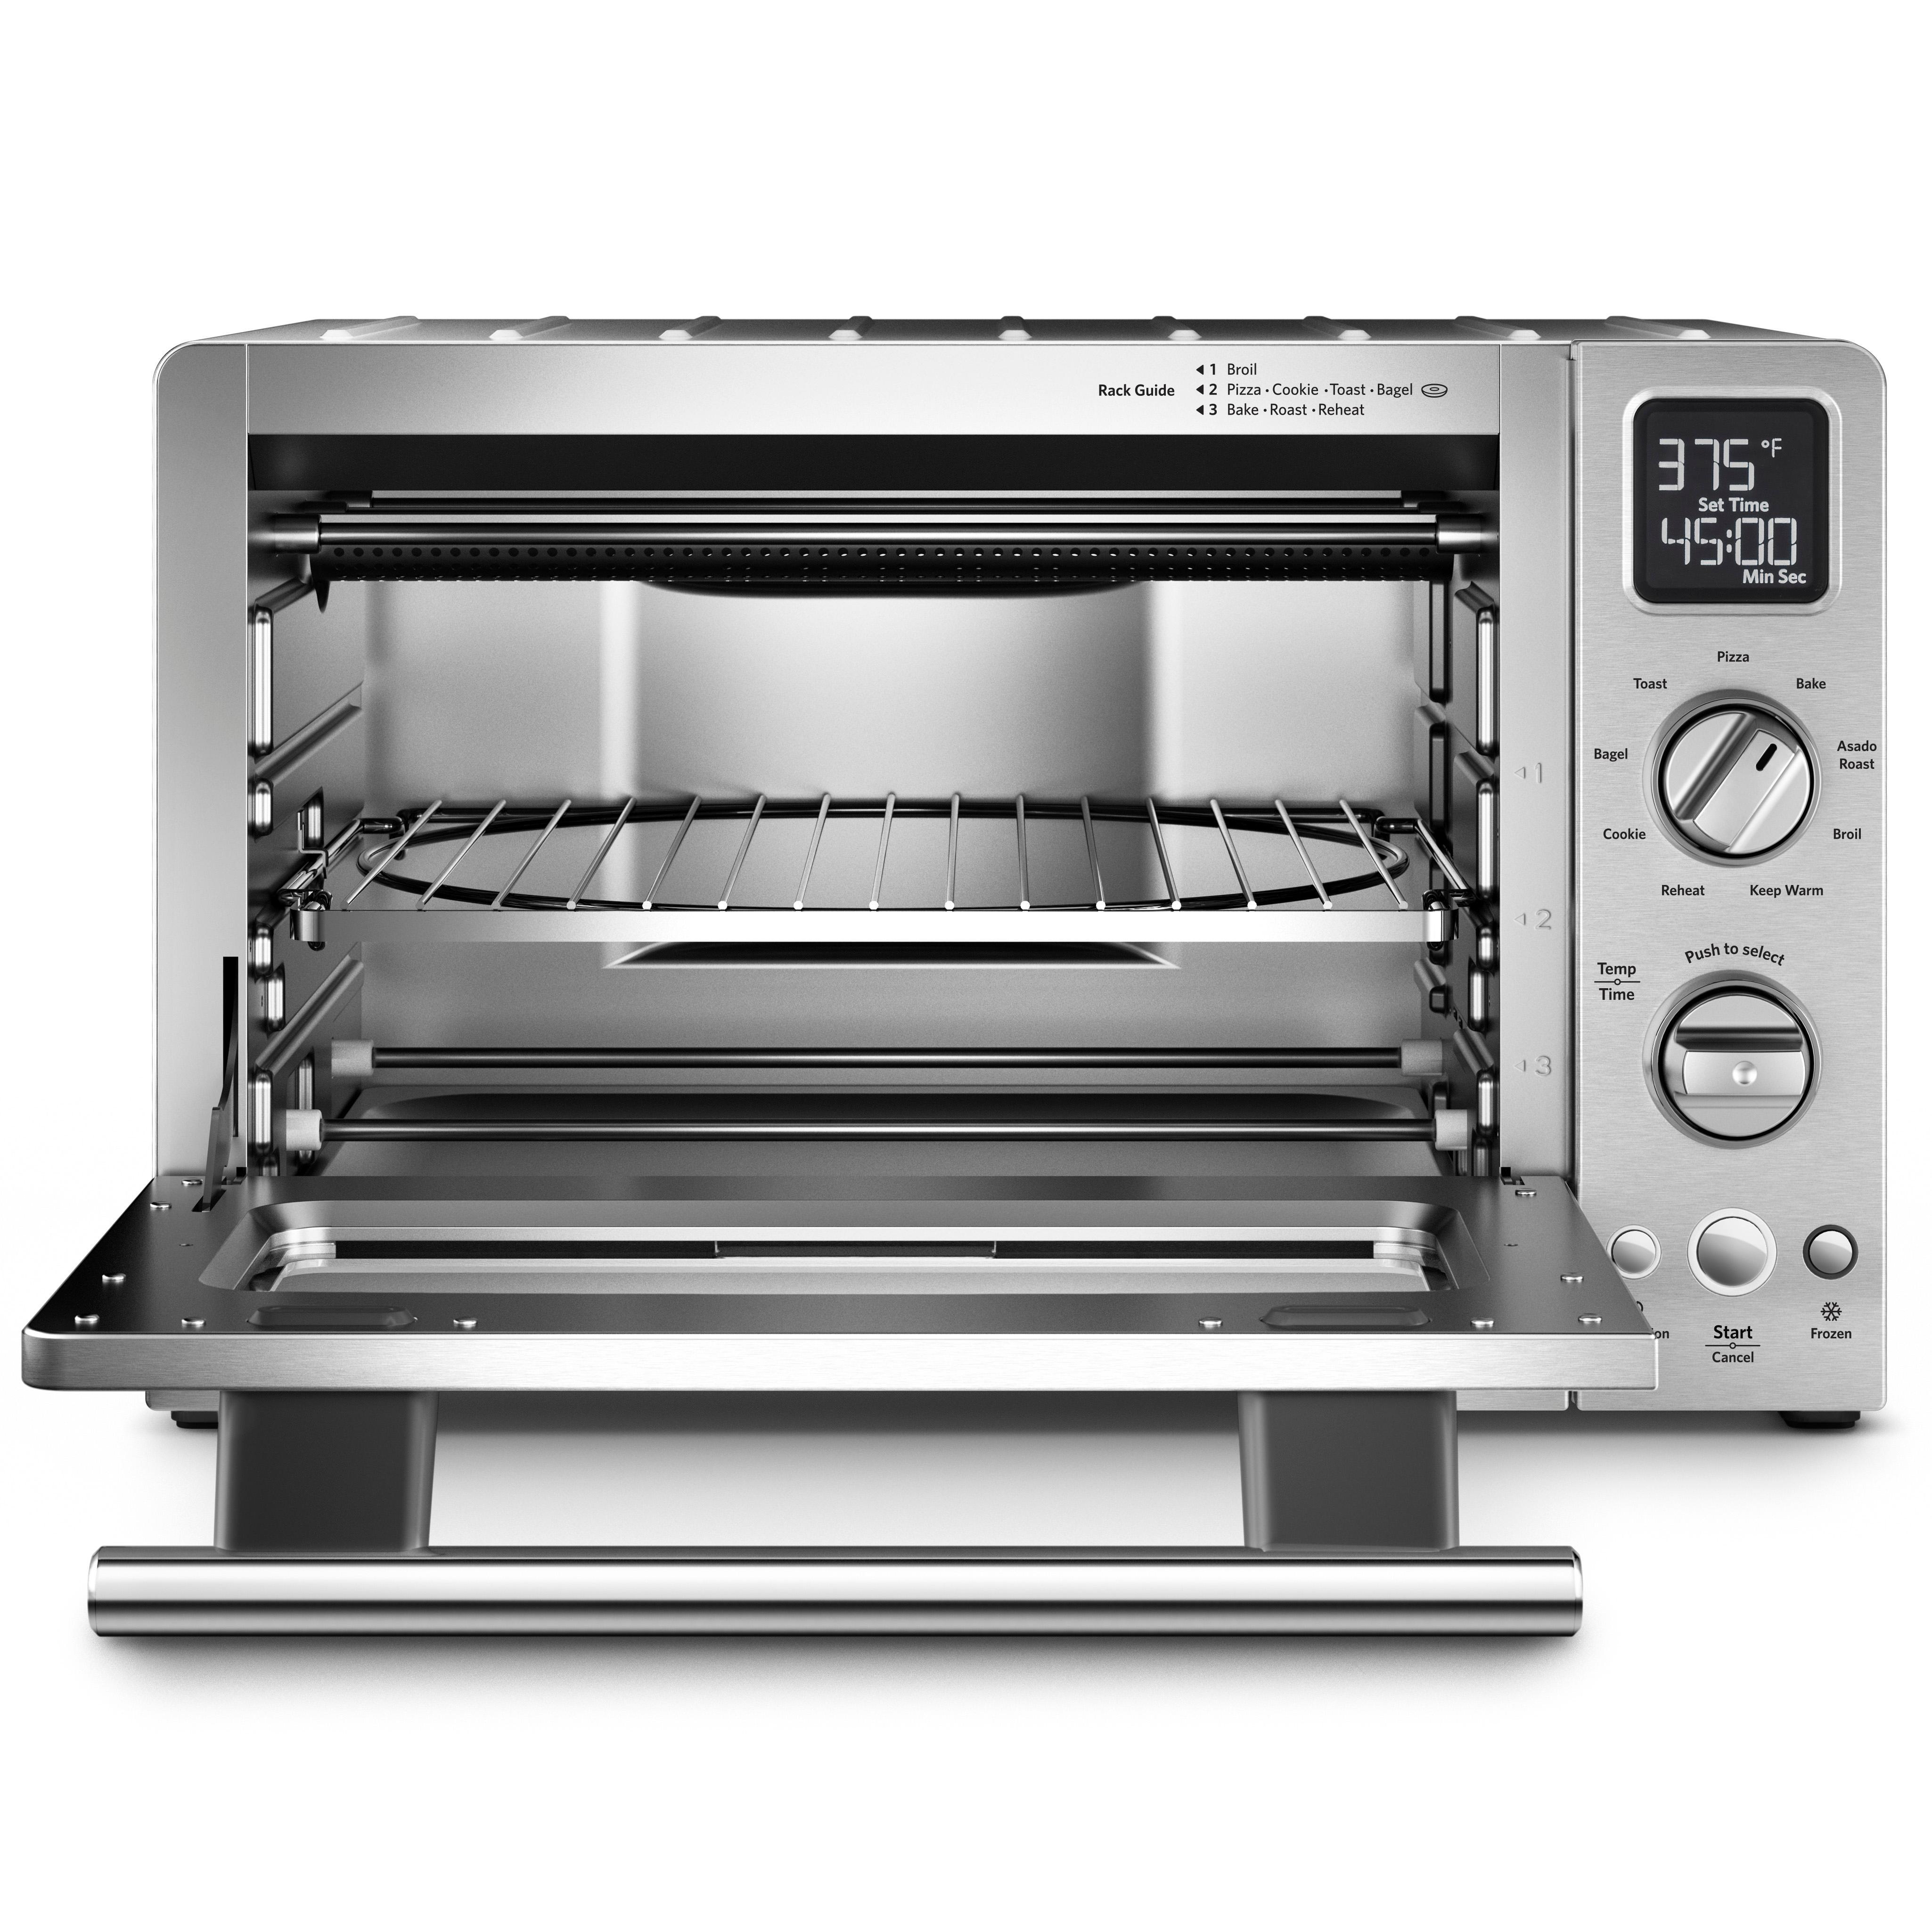 oven com toaster stainless decker black countertops countertop large steel convection ip walmart